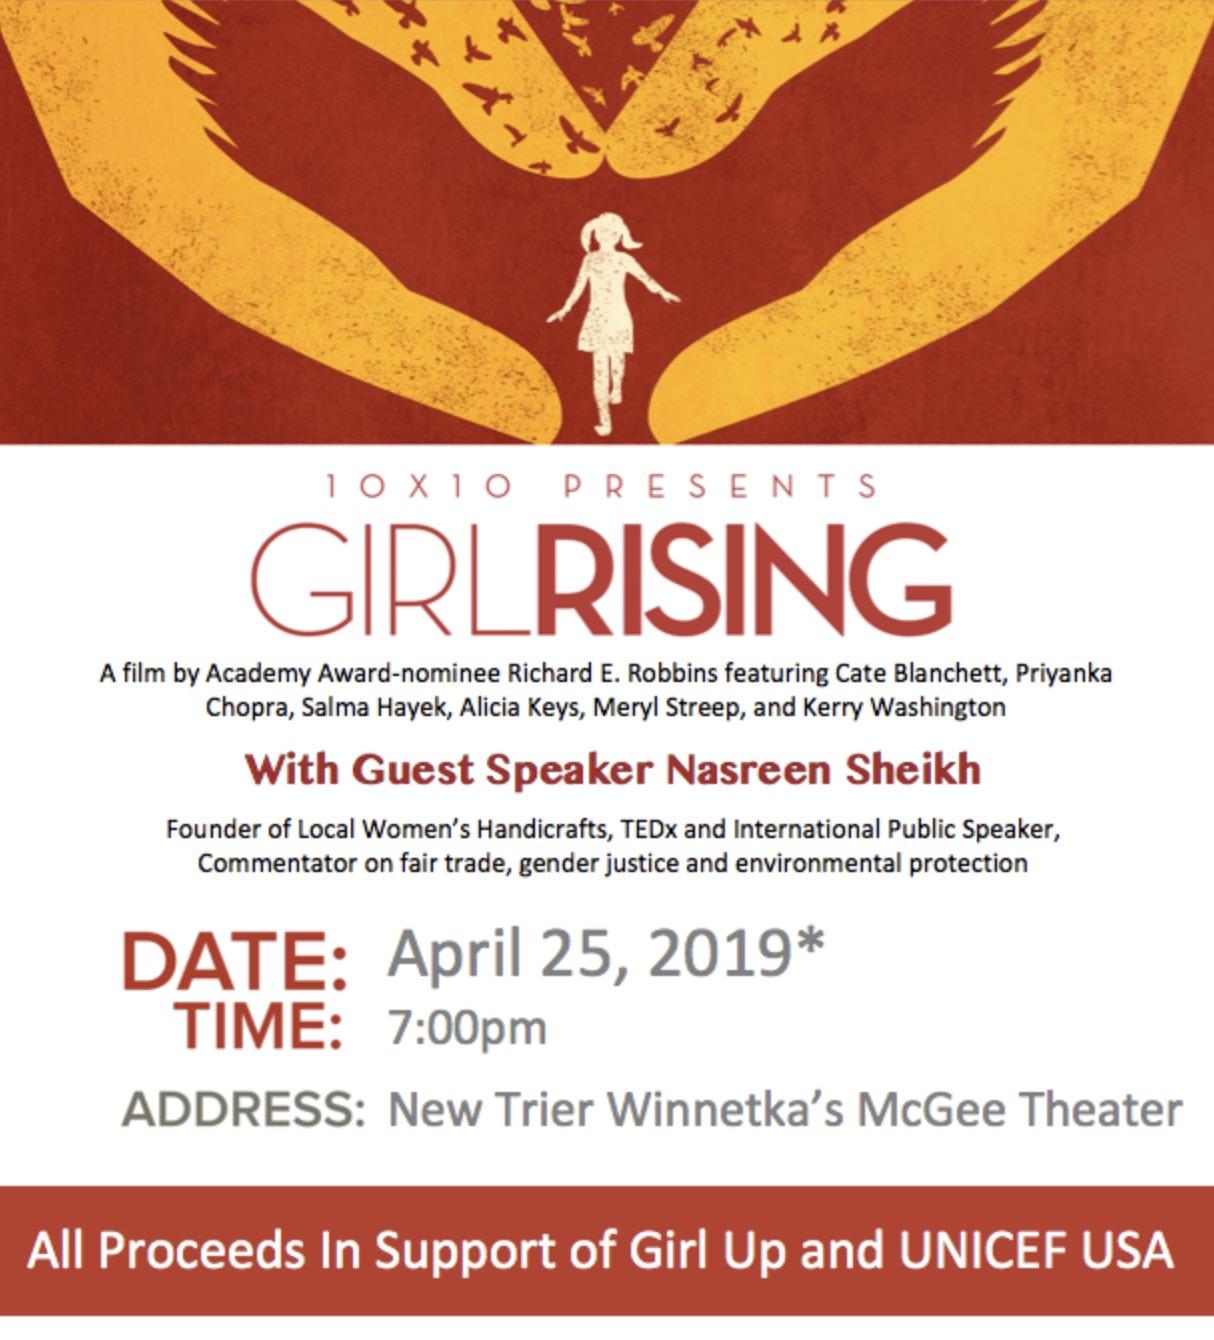 Girl Rising Film Screening with Guest Speaker Nasreen Sheikh